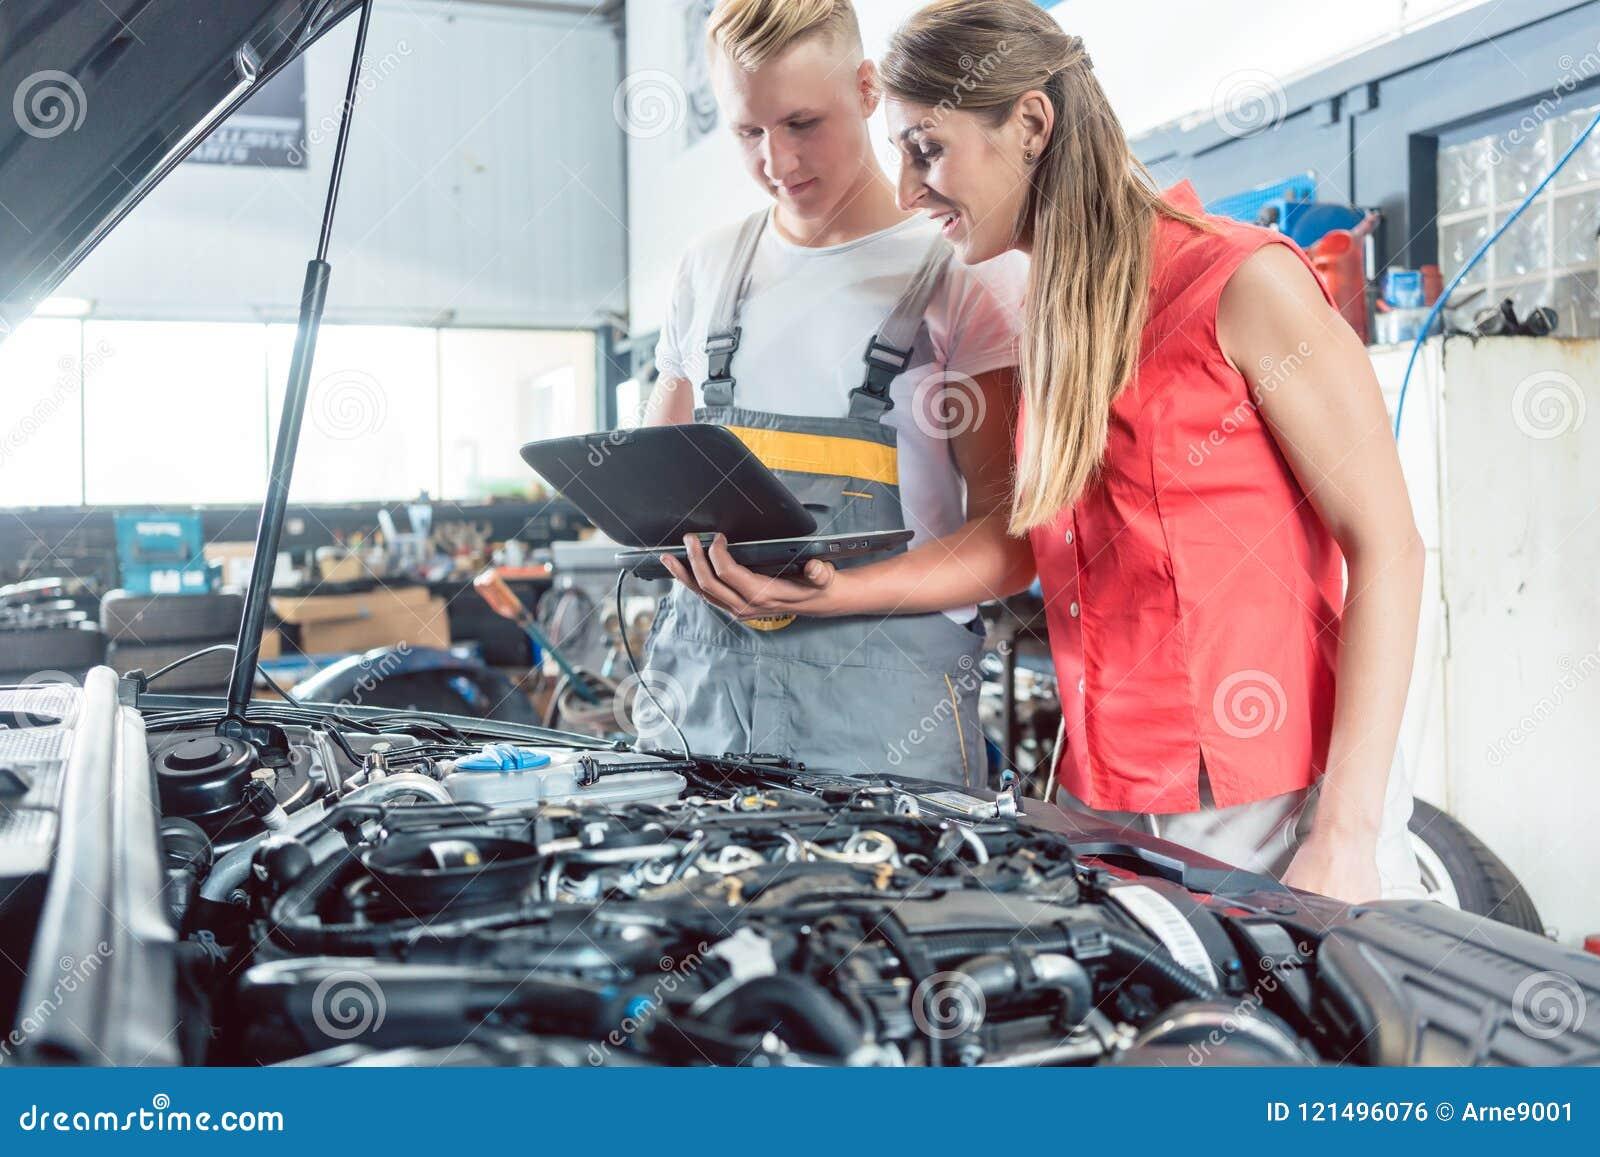 Reliable Auto Mechanics >> Auto Mechanic Showing To A Customer The Engine Error Codes